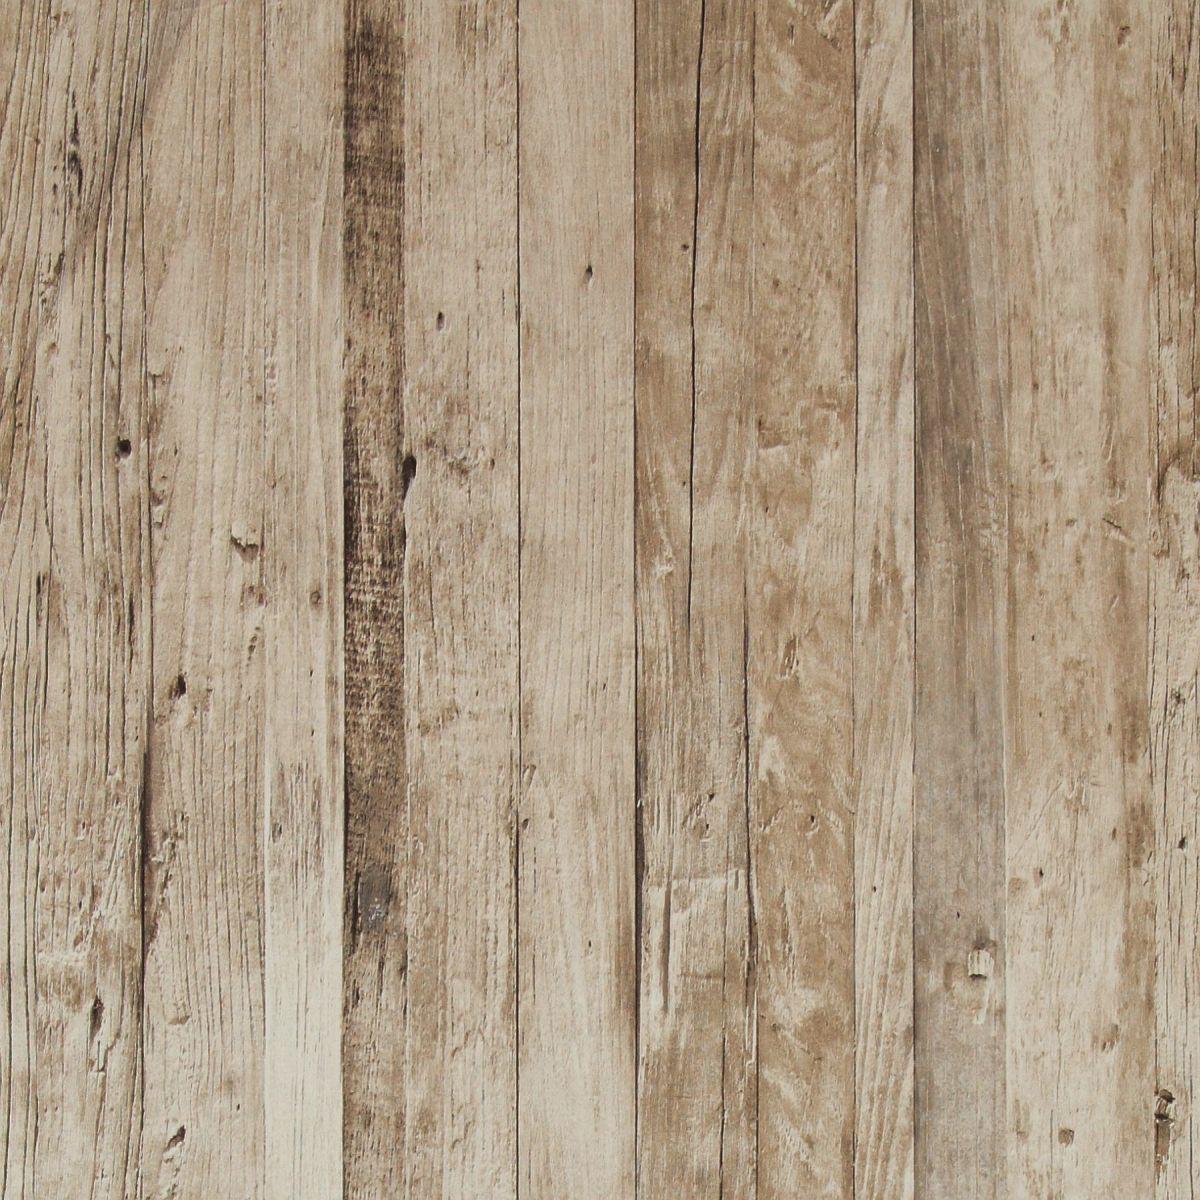 hochwertige tapeten und stoffe b n wallcoverings vliestapete riviera maison 18293 decowunder. Black Bedroom Furniture Sets. Home Design Ideas